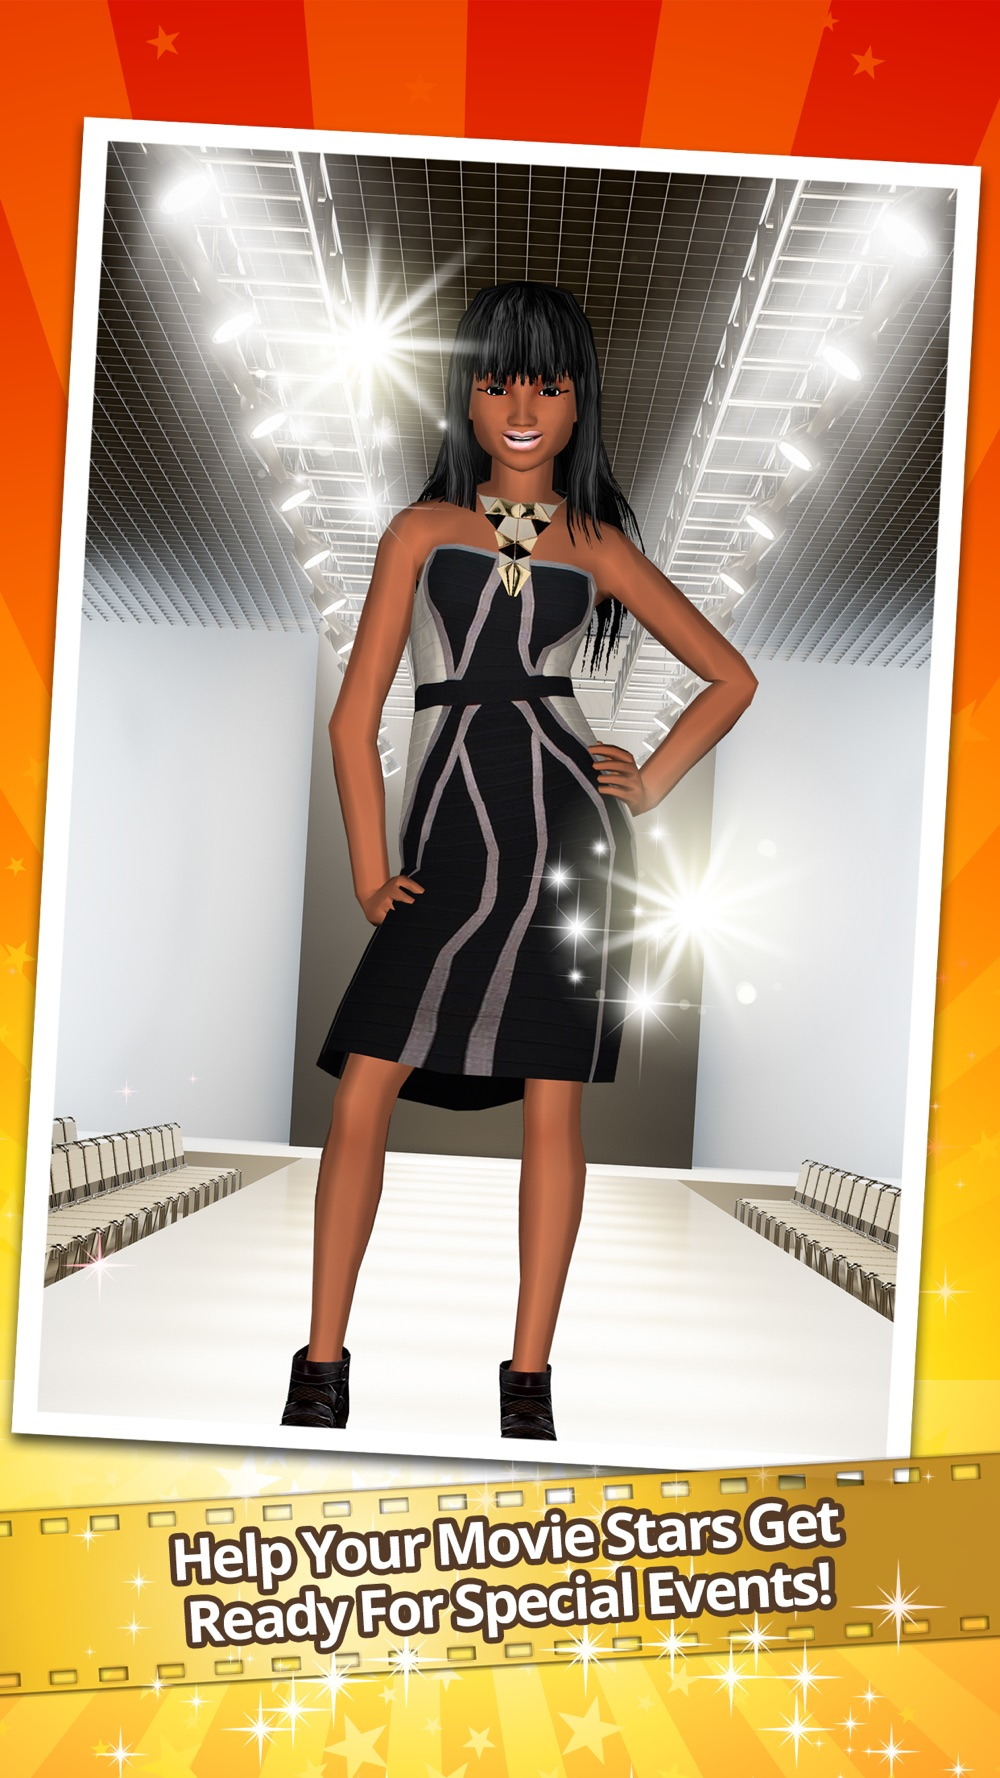 Me Girl Celebs - Dress your way to movie stardom! hack tool